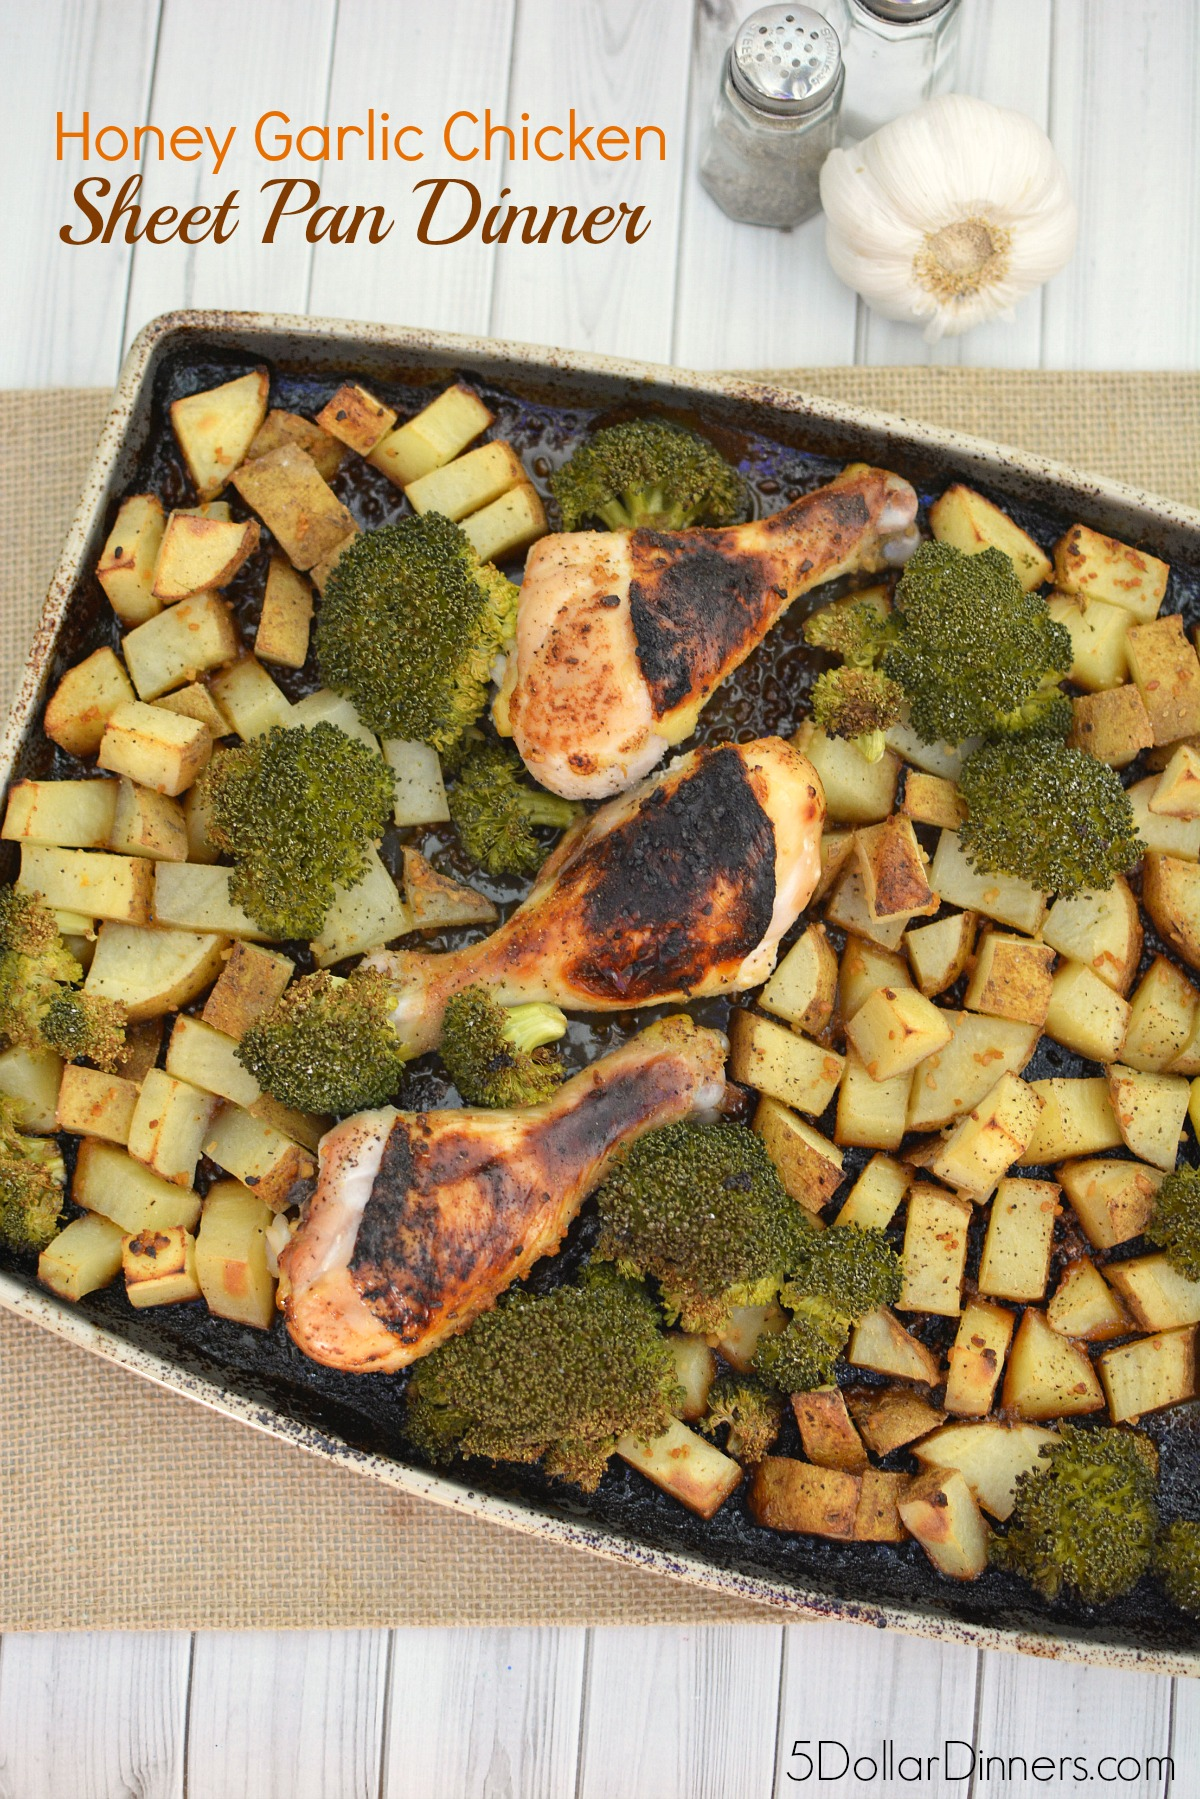 Honey Garlic Chicken Sheet Pan Dinner from 5DollarDinners.com